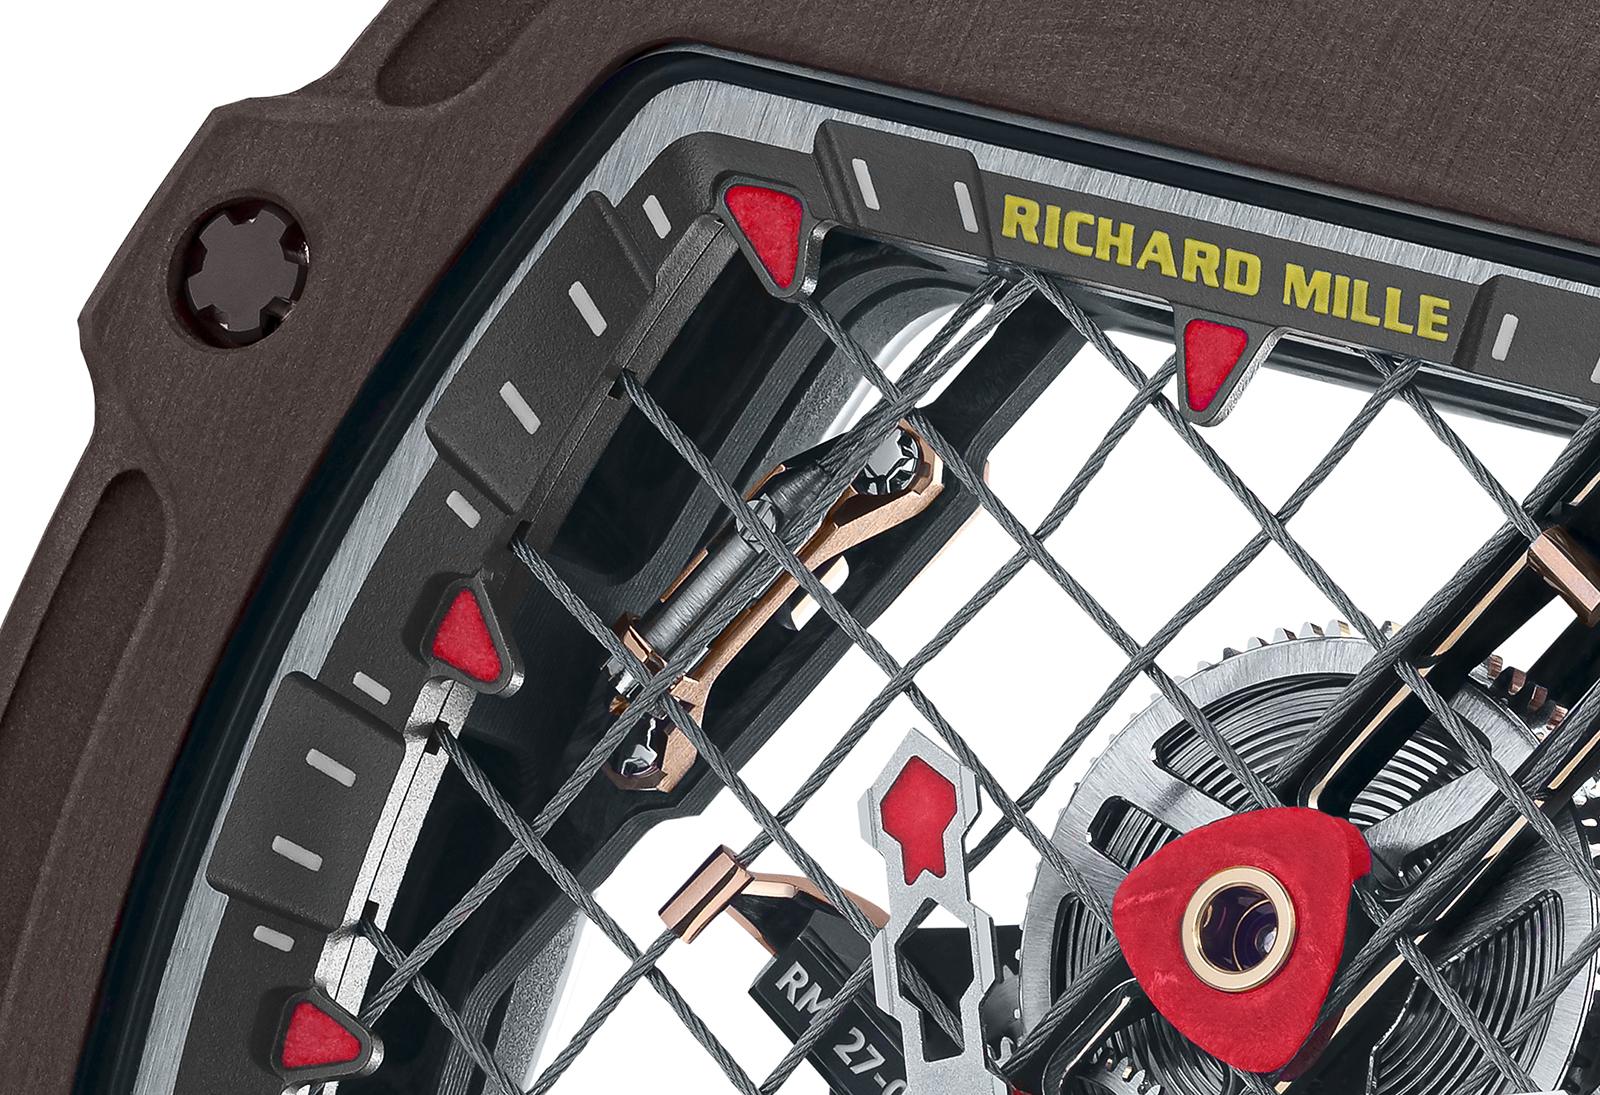 Richard Mille RM 27-04